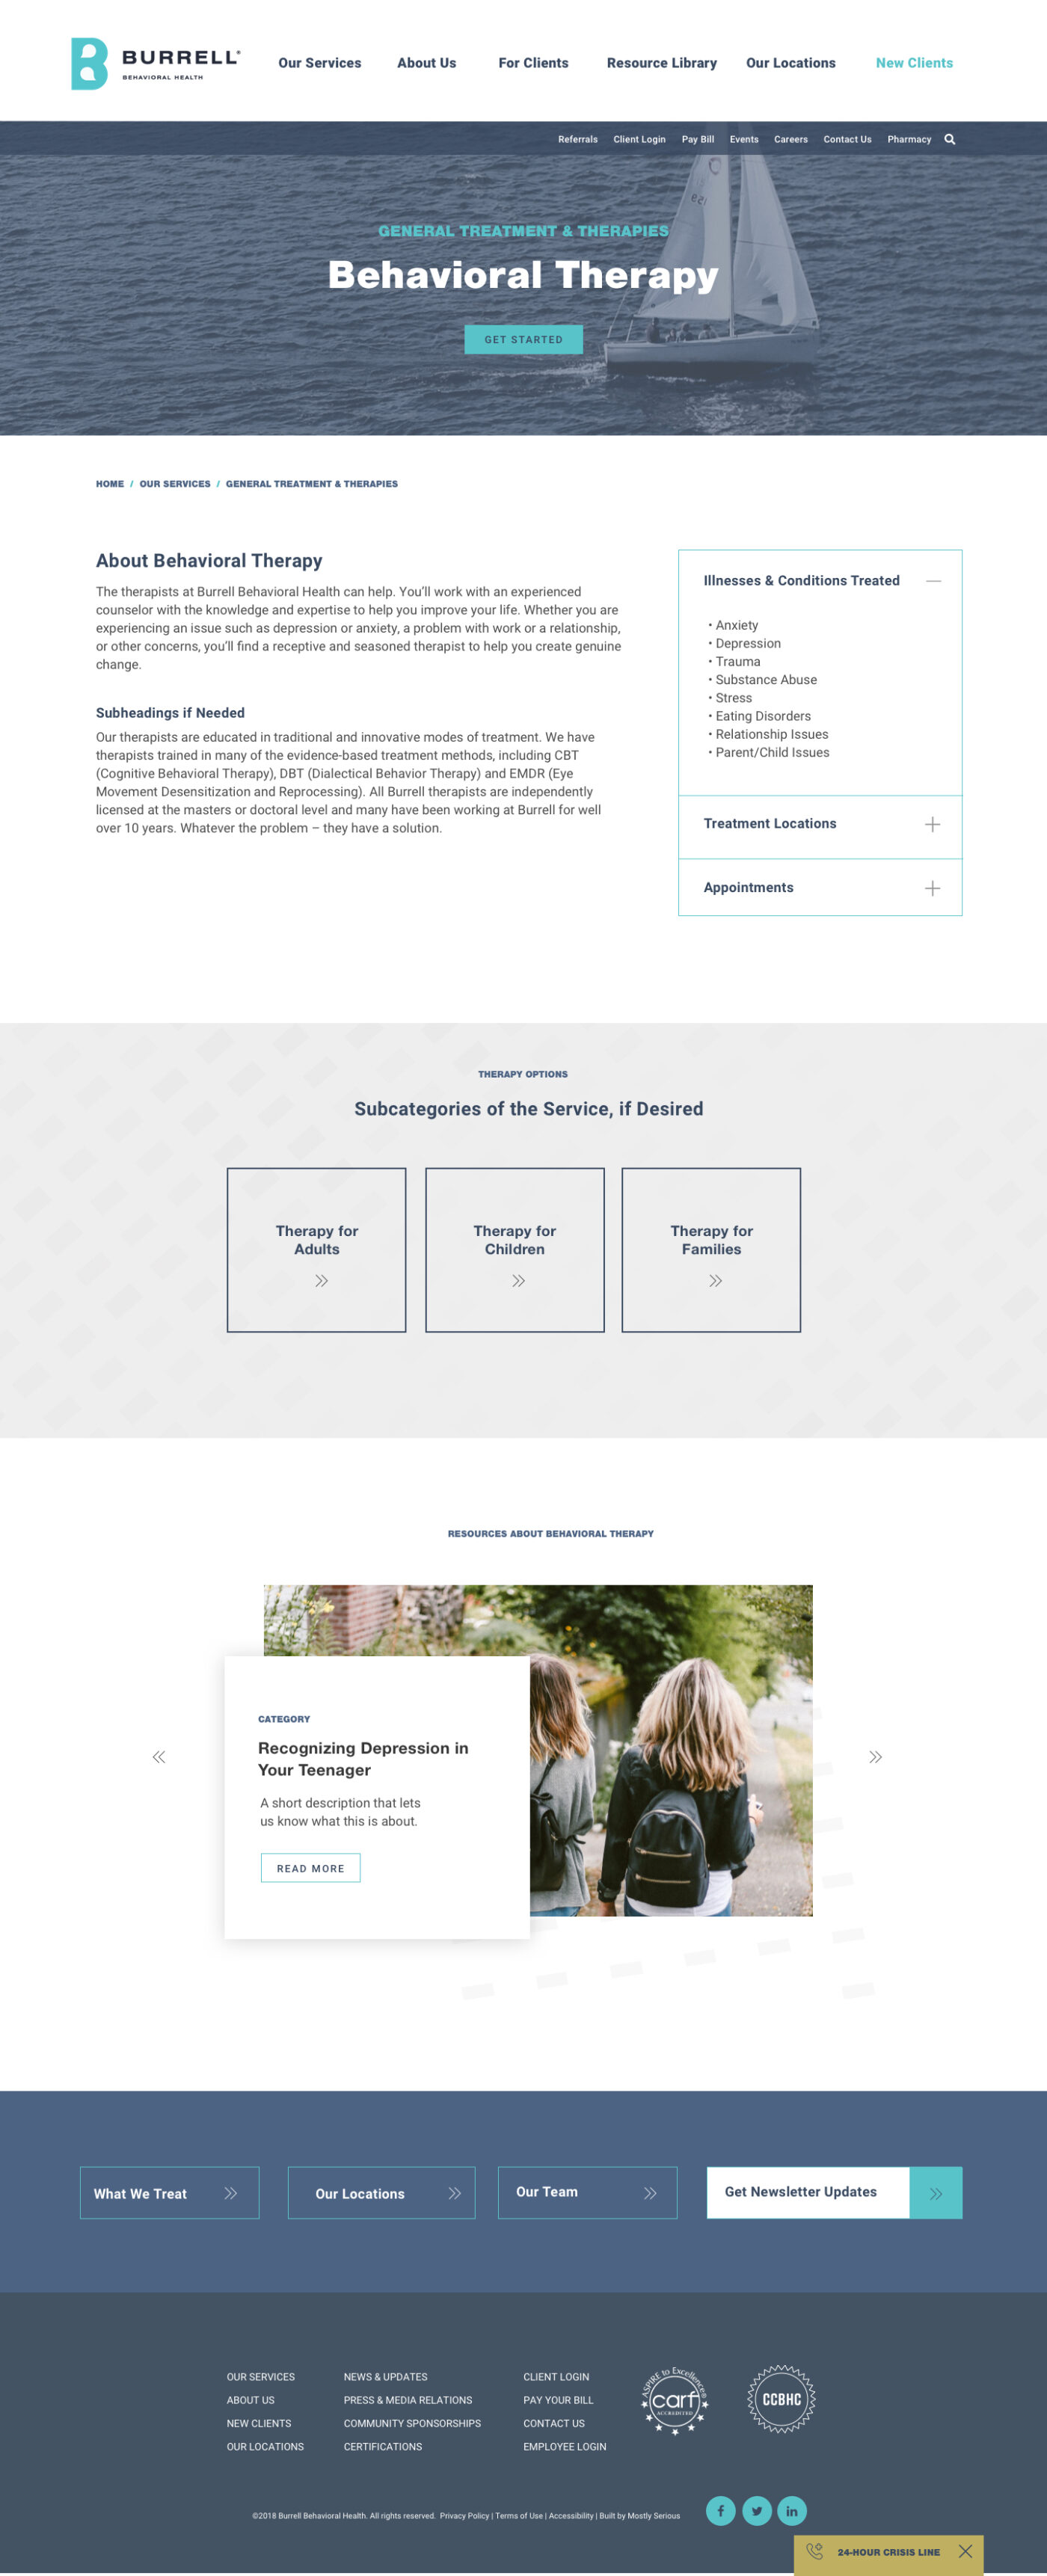 Service Category Page